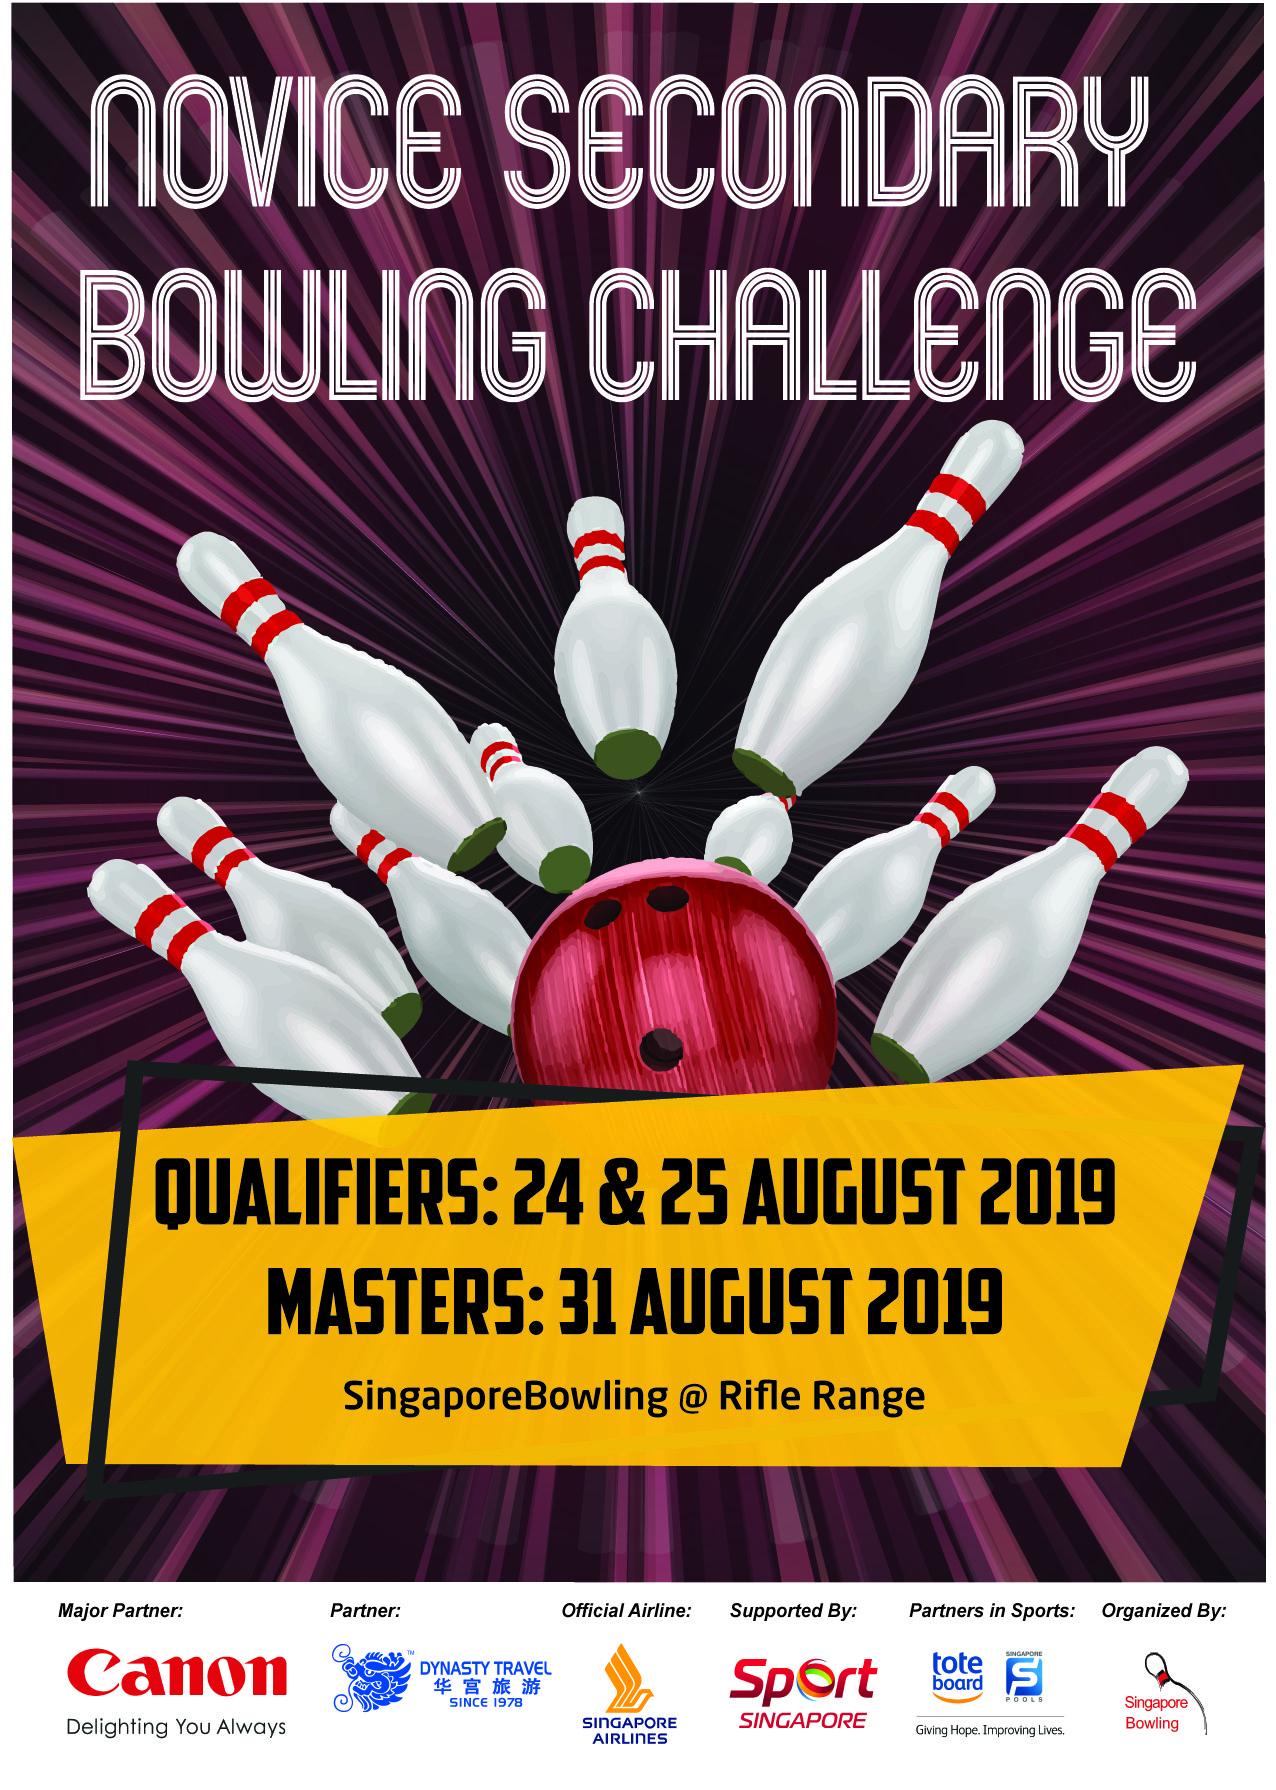 Novice Secondary Bowling Challenge 2019